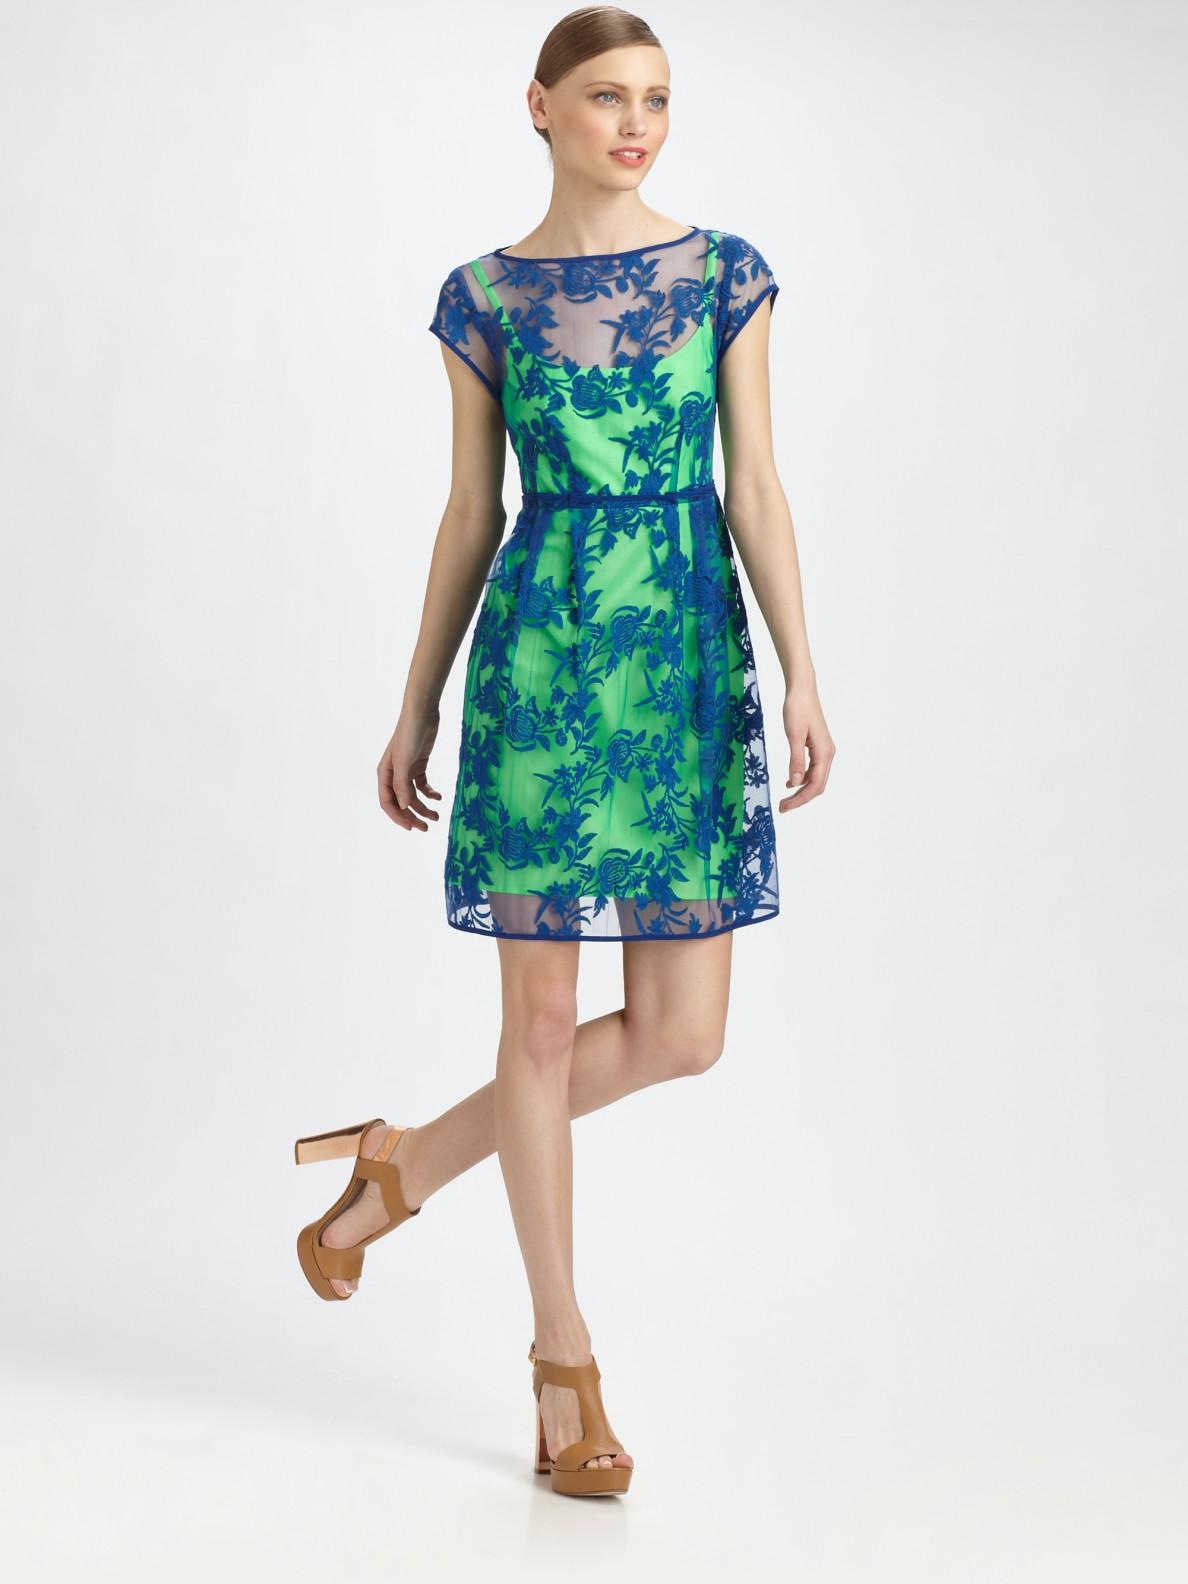 Nanette Lepore Blue Dress - KD Dress